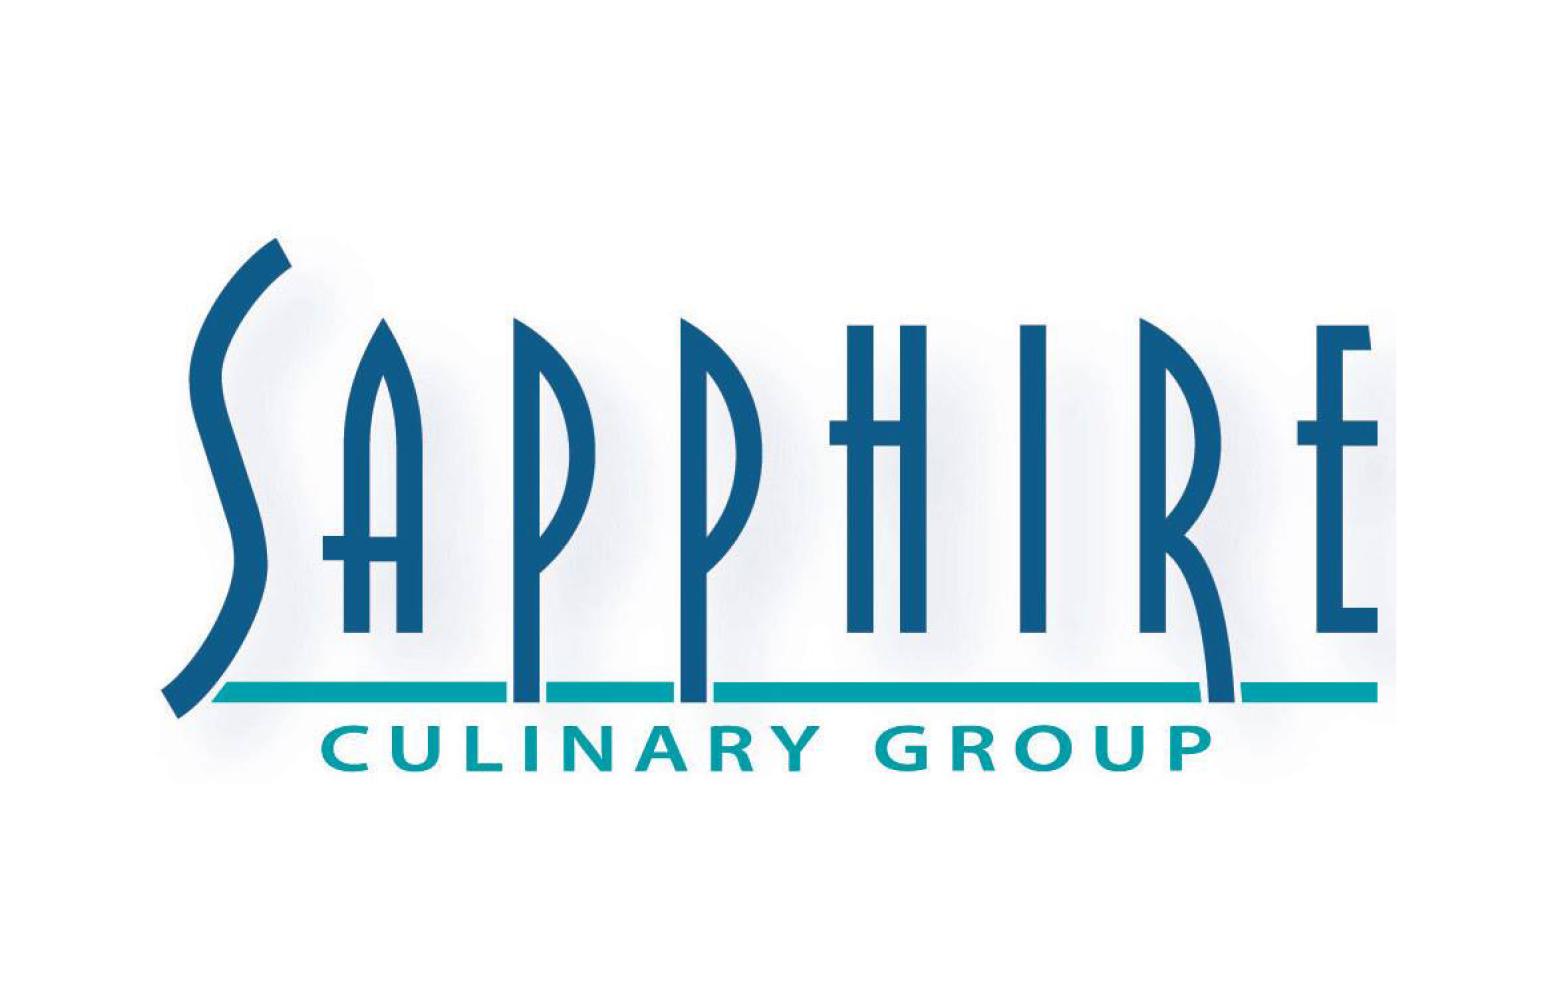 Sapphire Culinary Group